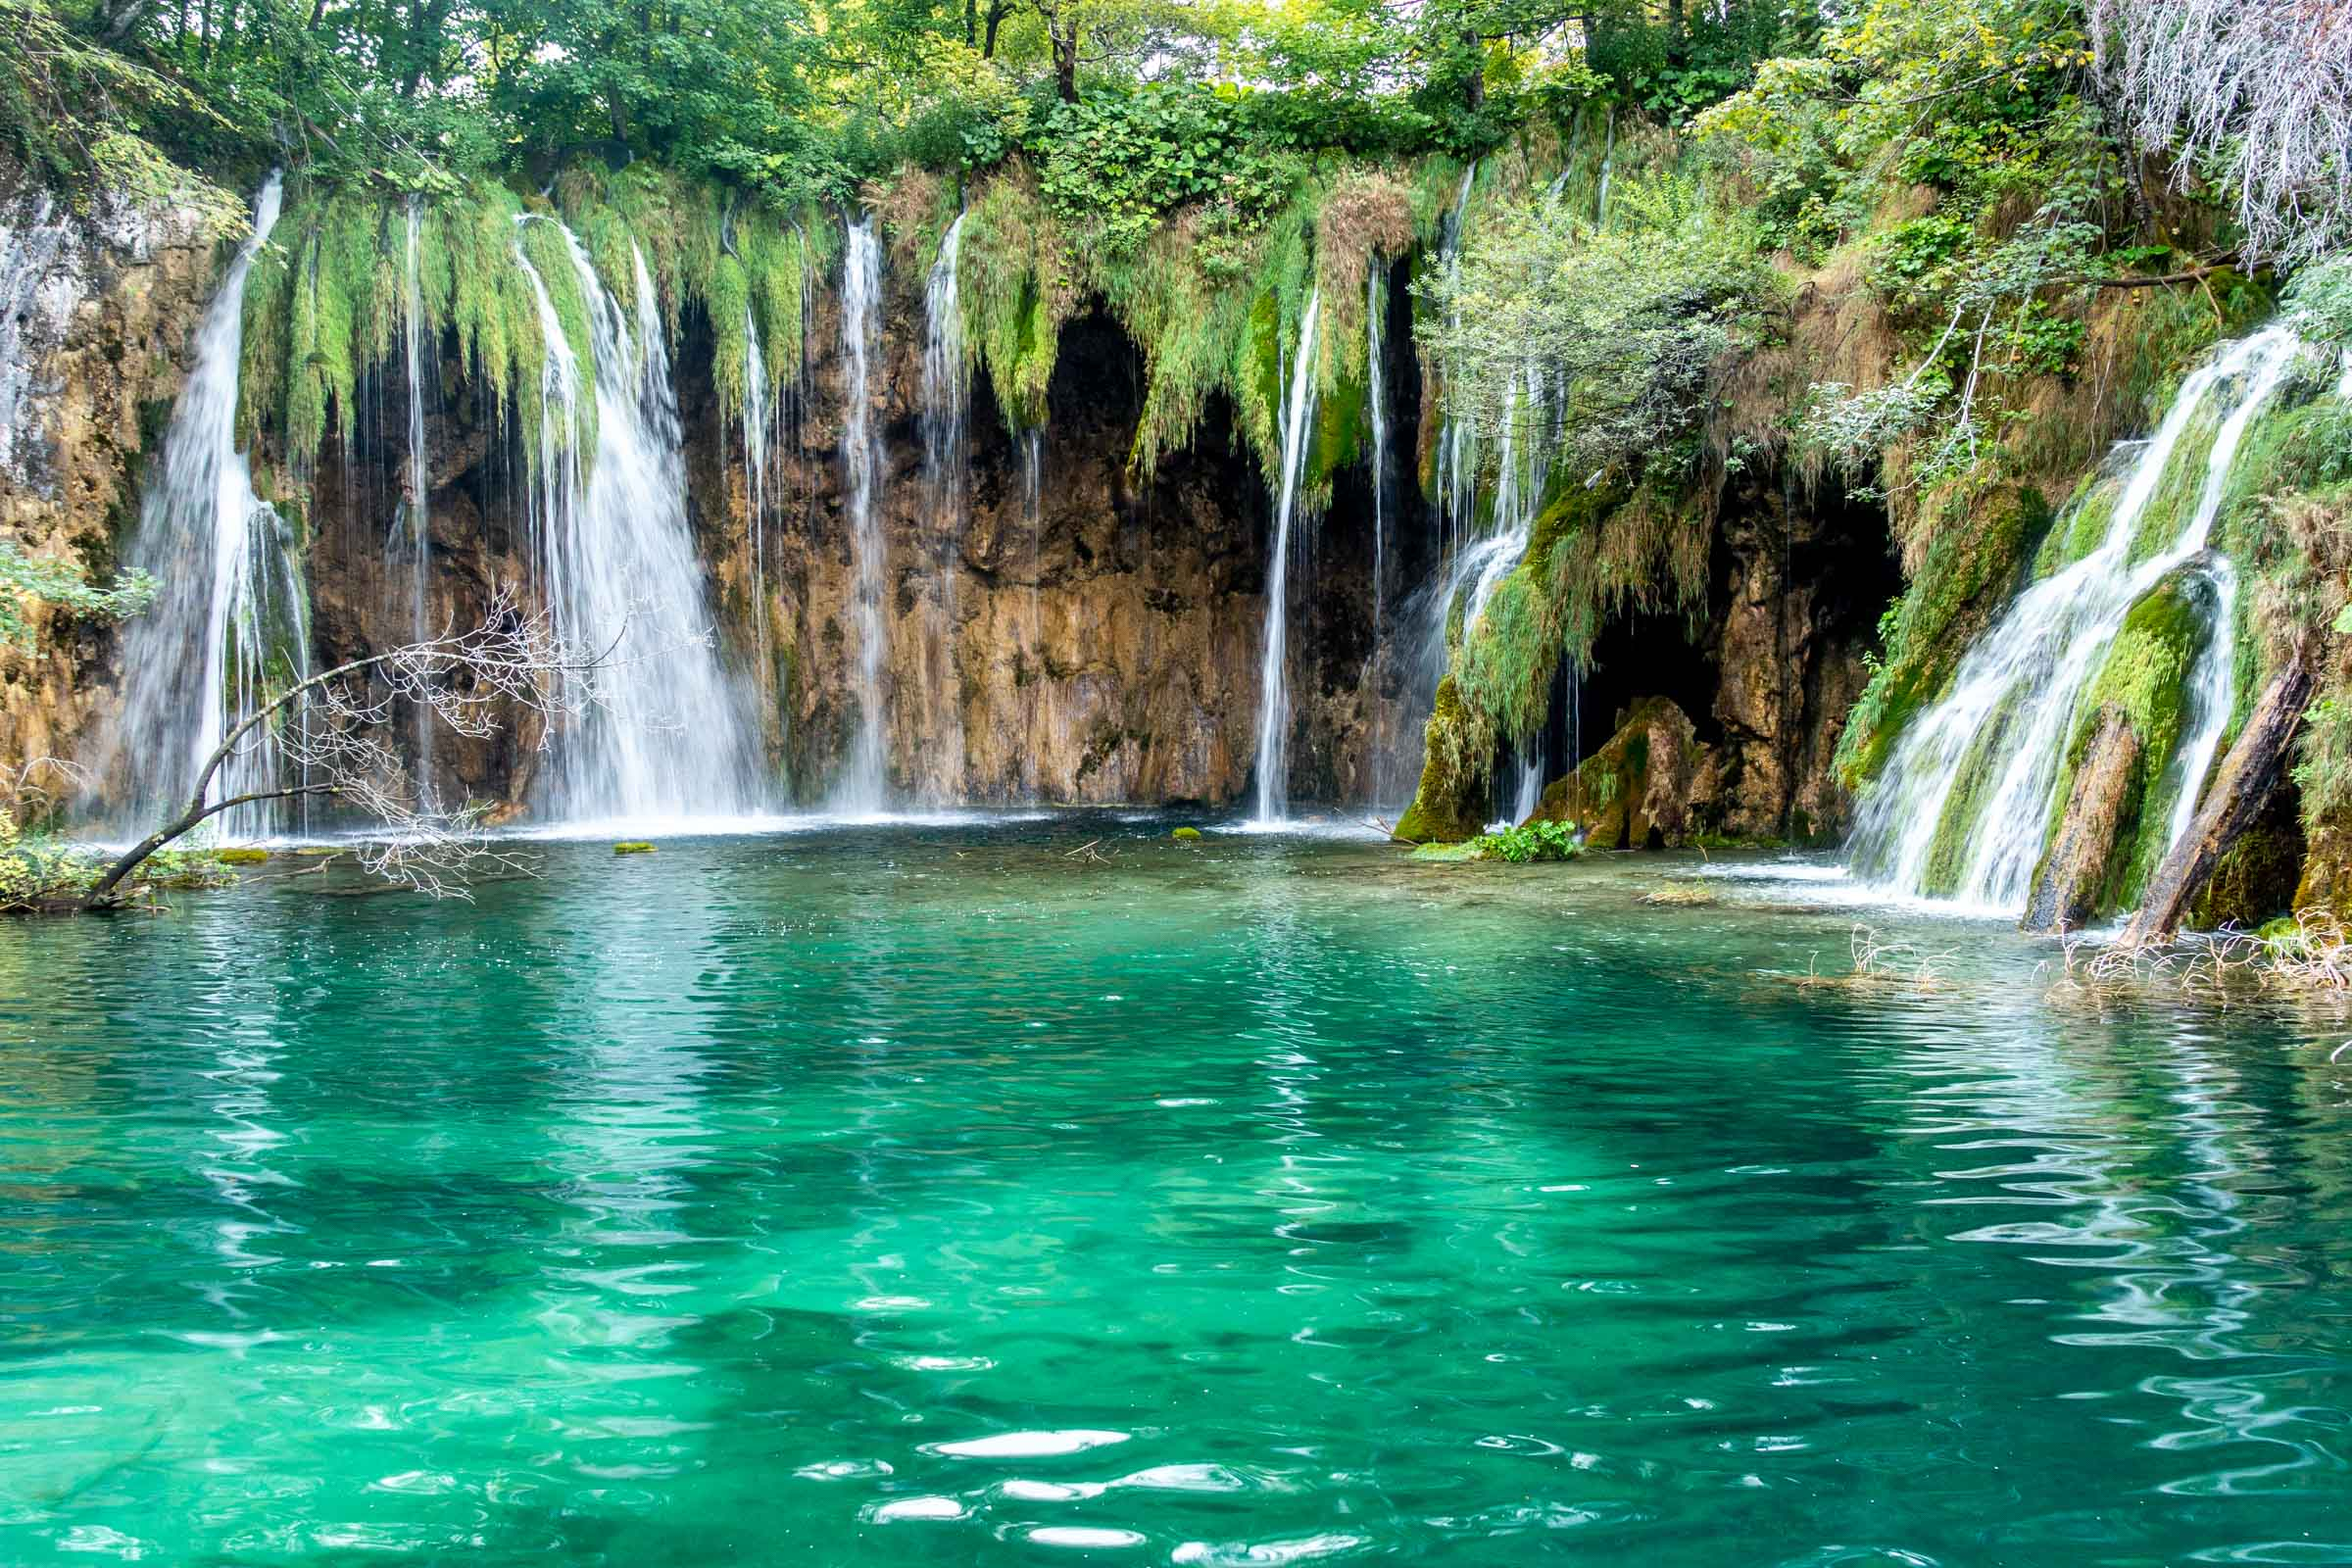 Waterfalls falling into lake